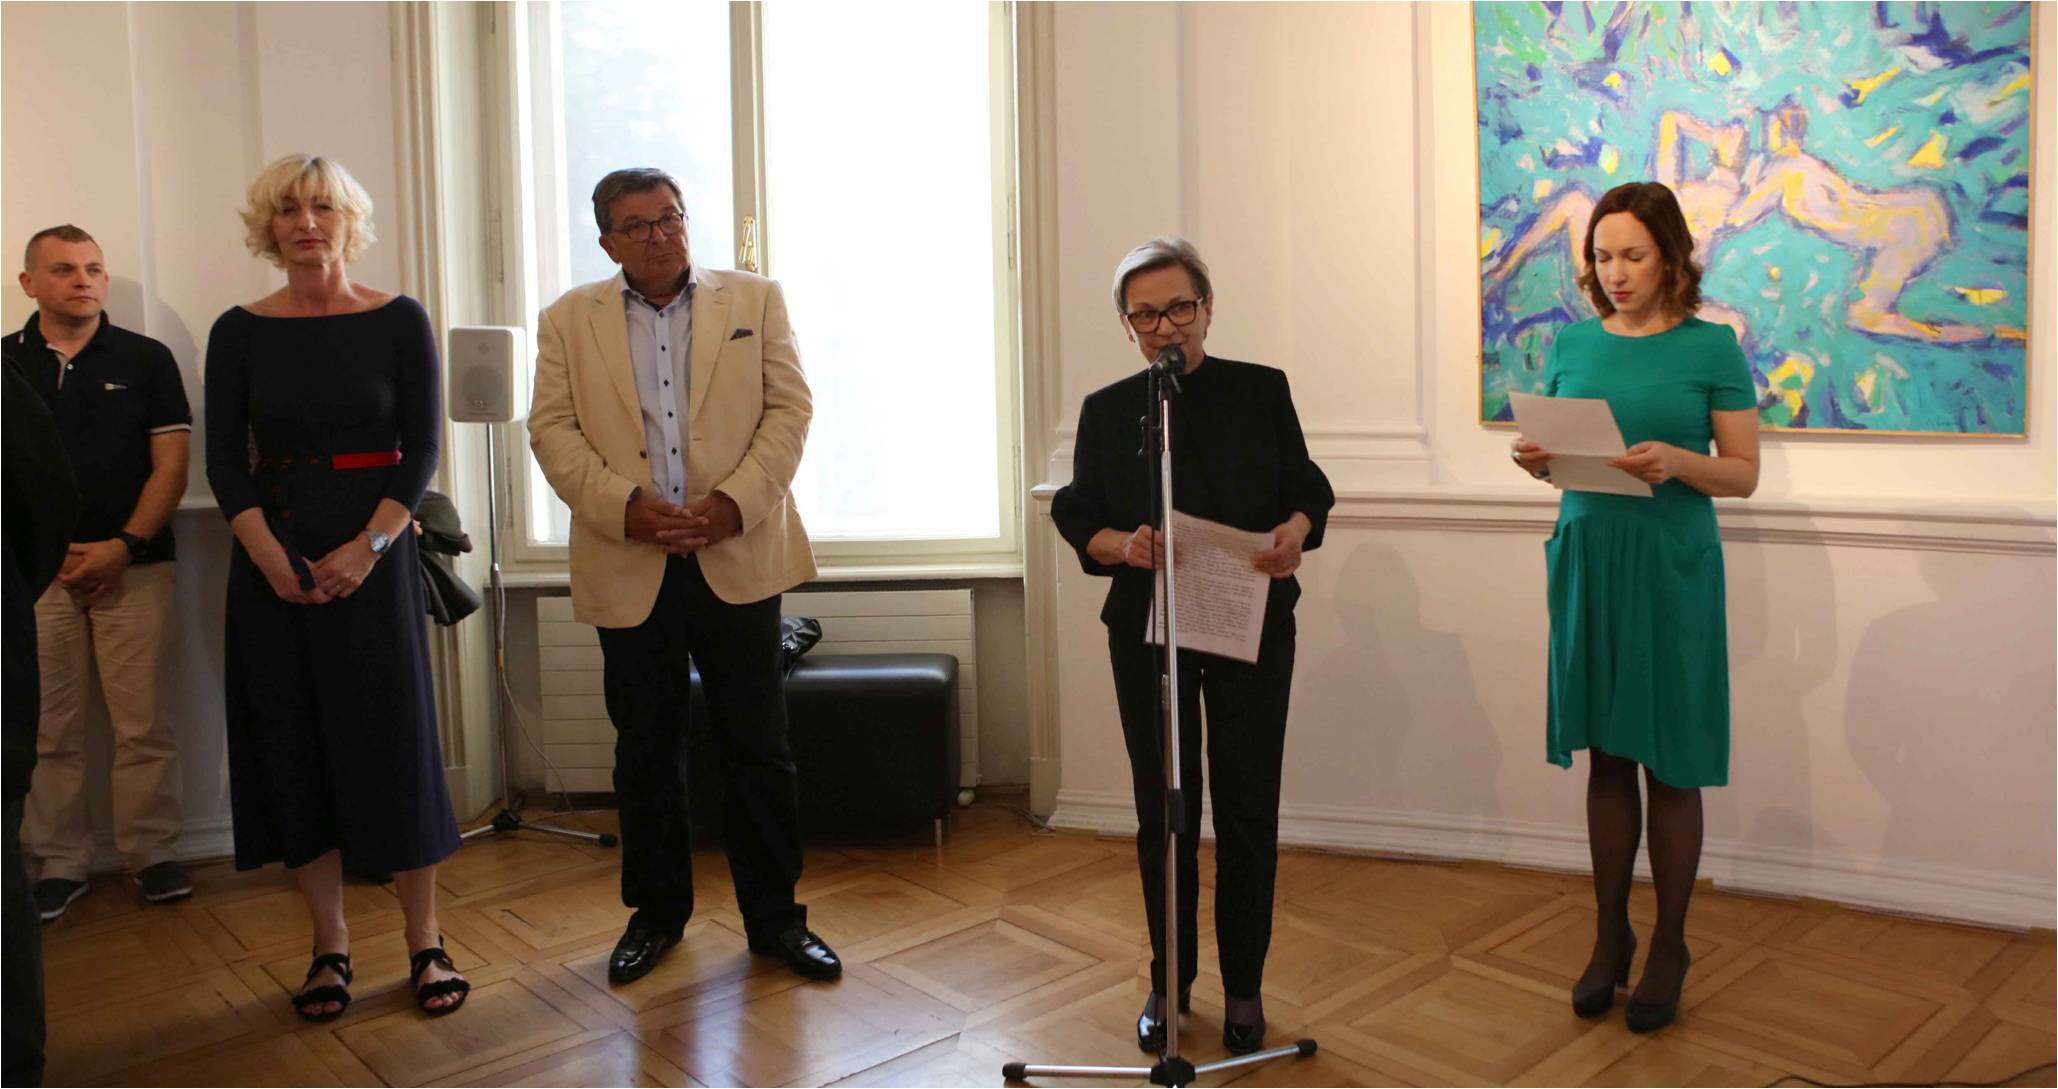 Dalibor Parać donacija Modernoj galeriji 1